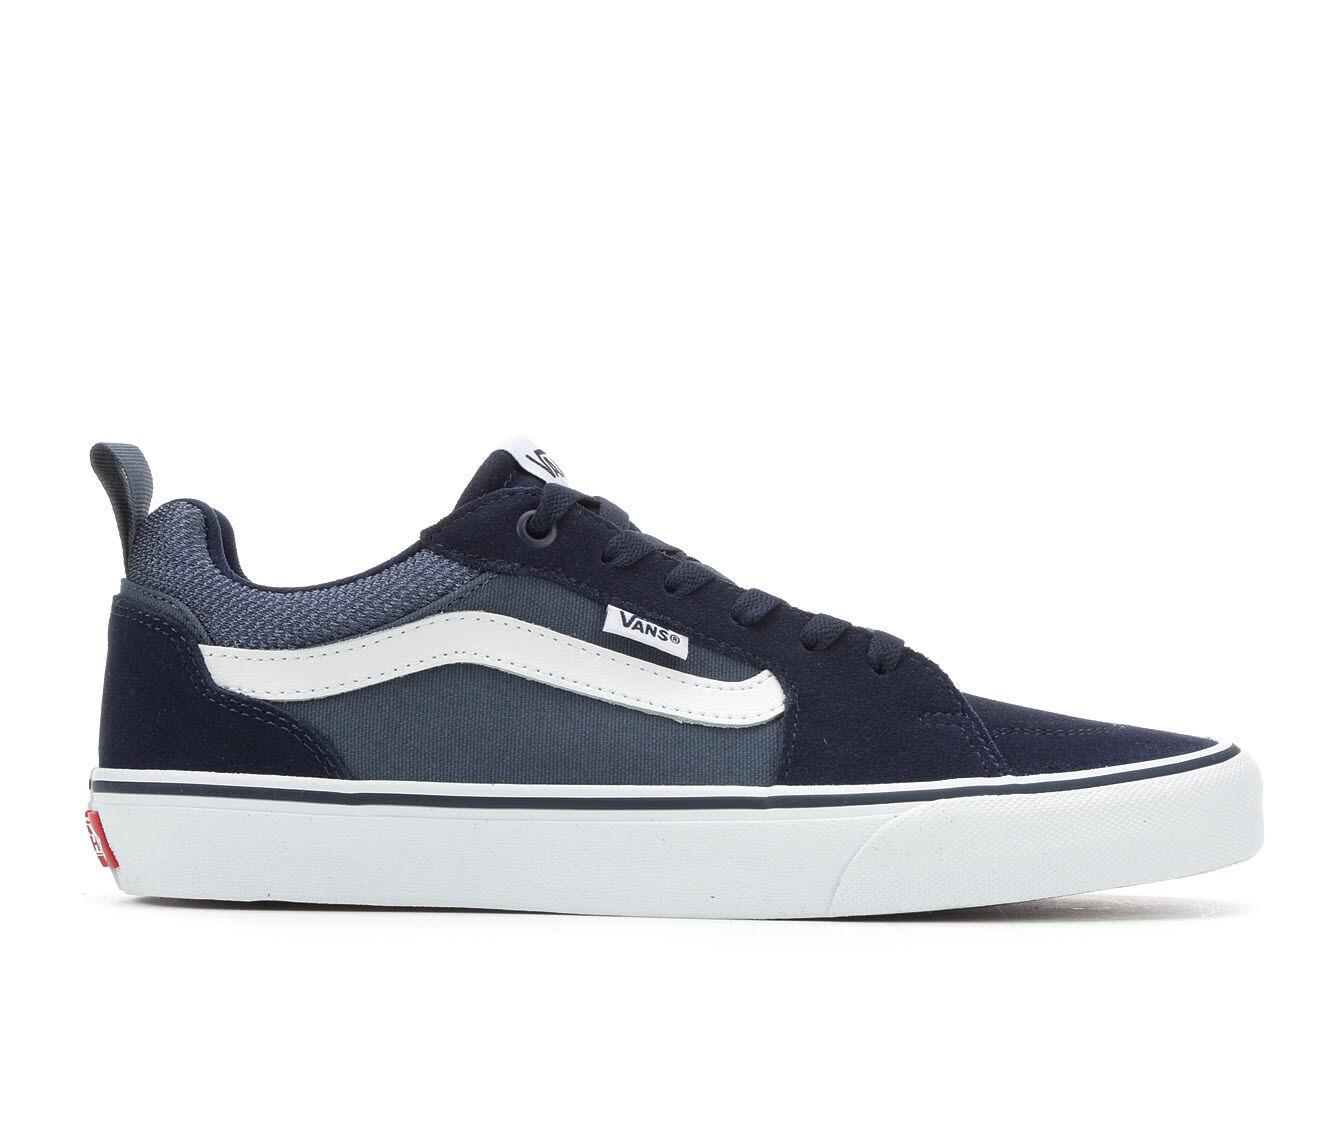 Men's Vans Filmore Skate Shoes | Shoe